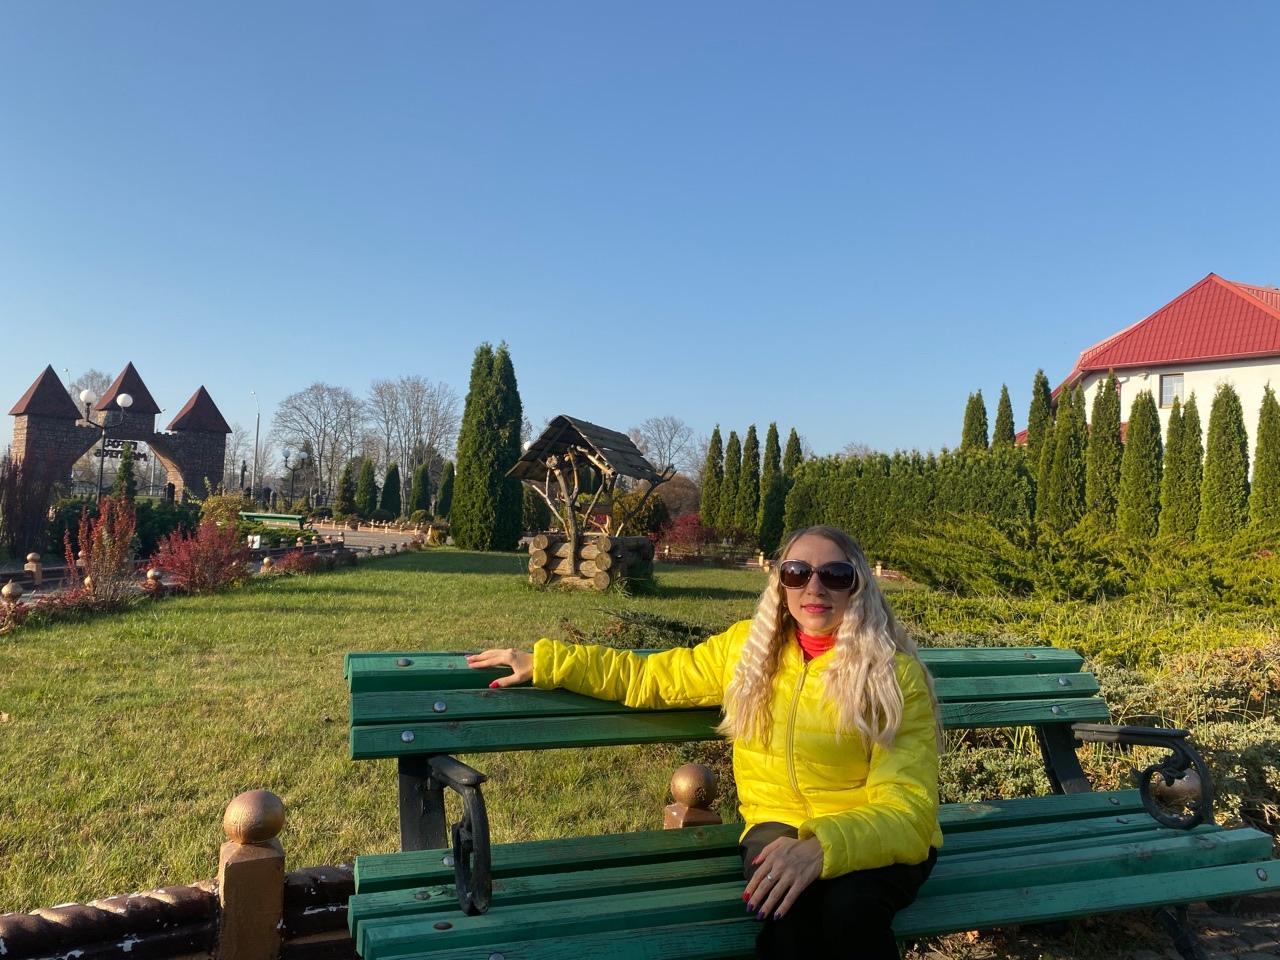 photo from album of Marinochka Milanka №9